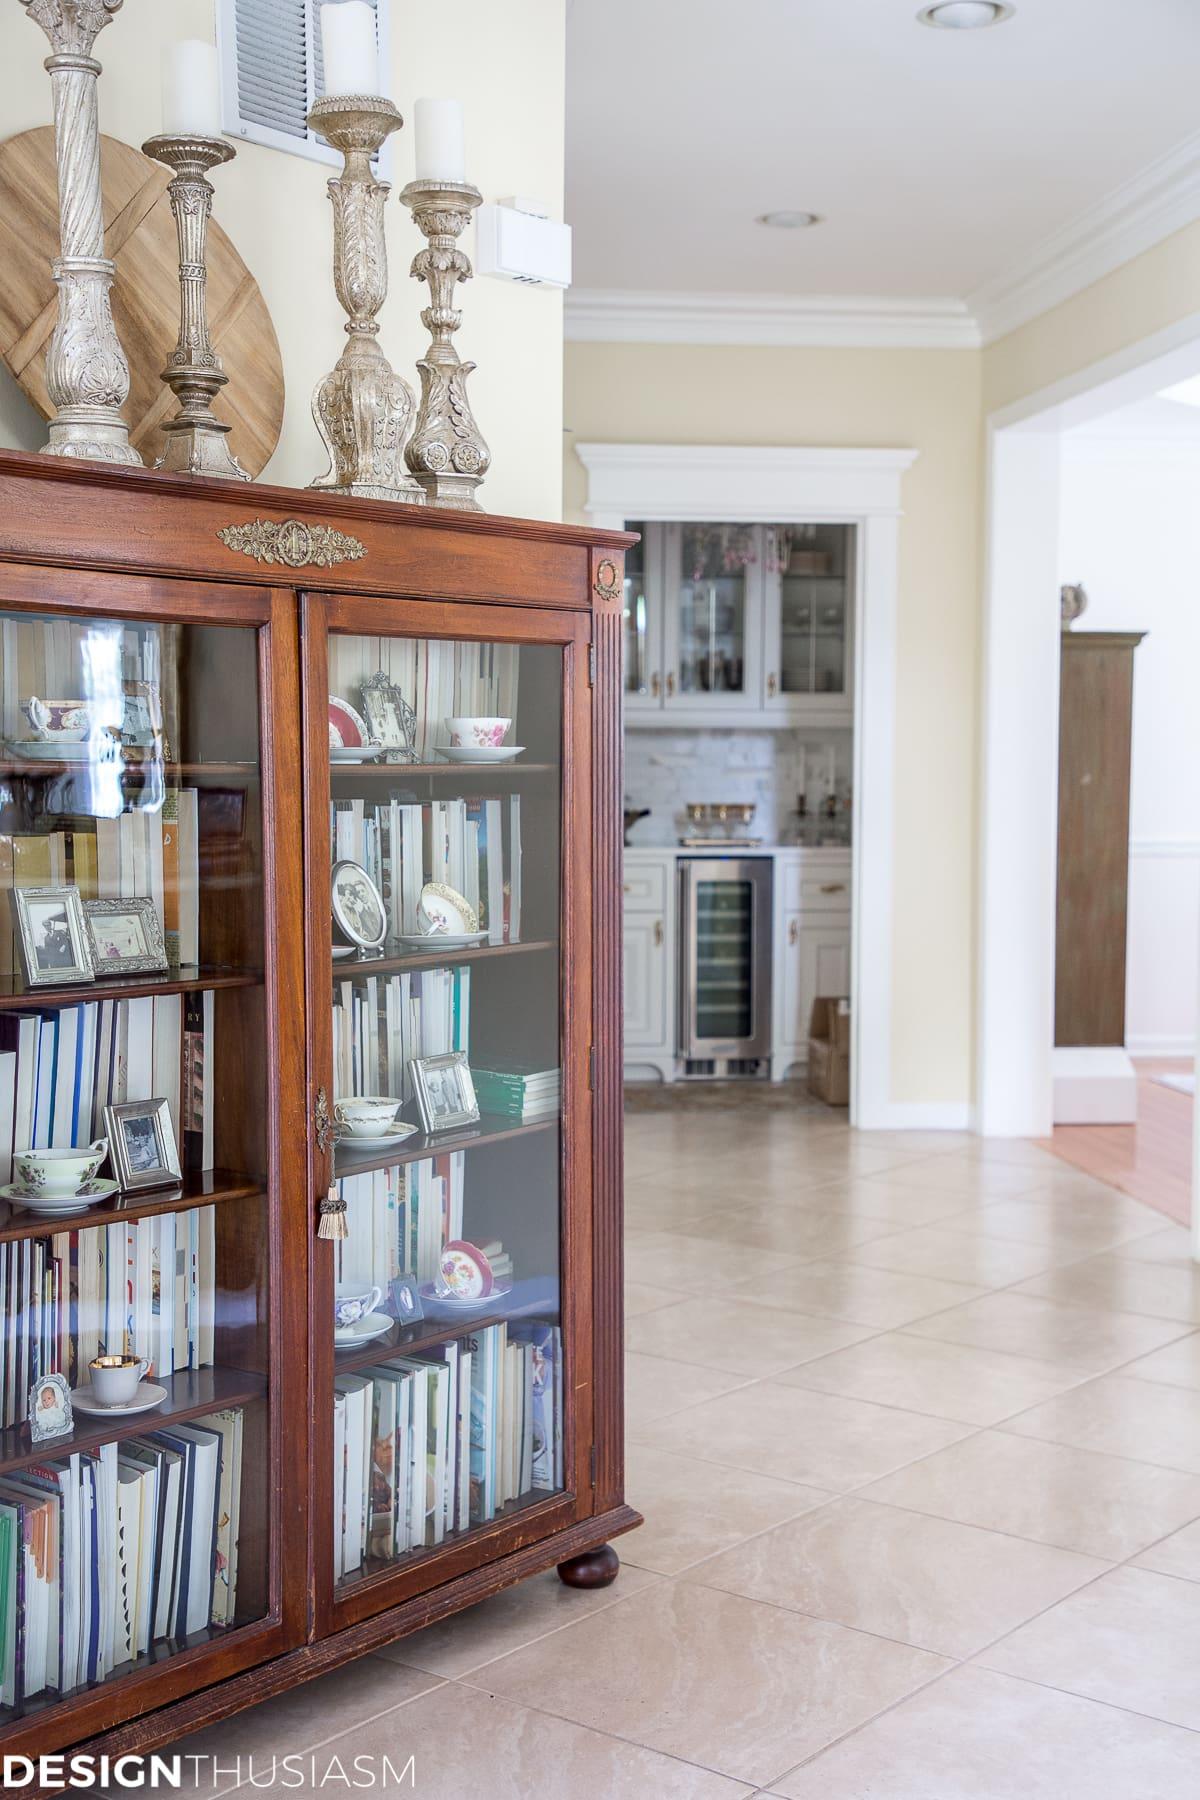 Elegant Foyer Rugs : Entryway rugs how to create an elegant entry foyer